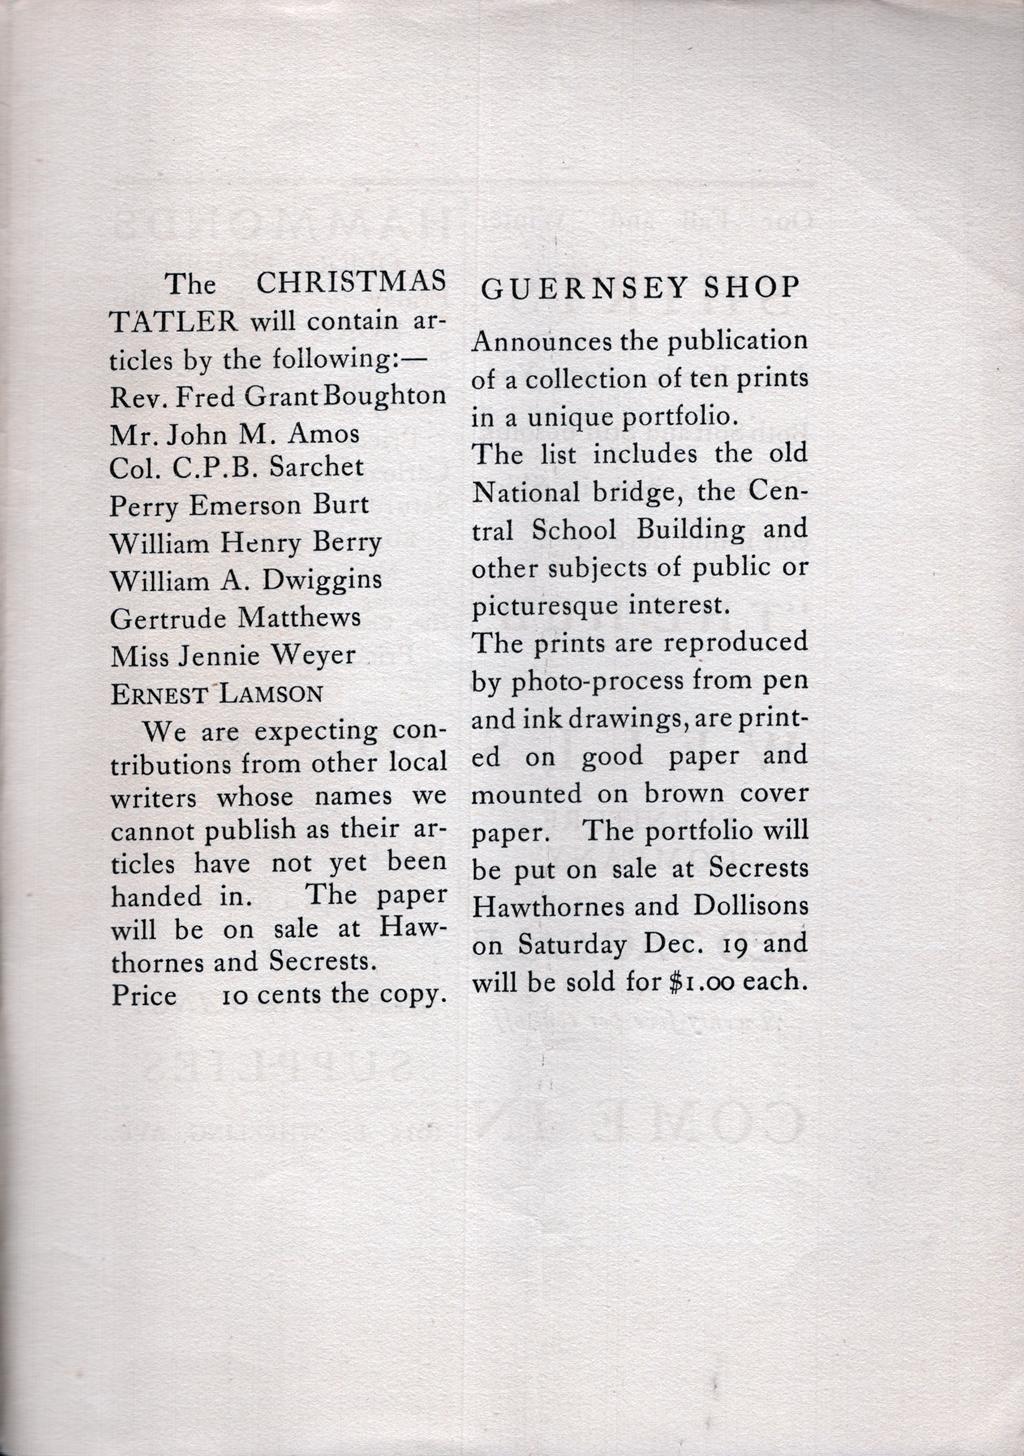 Advertisement for a collection of ten prints of views of Cambridge. The Tatler, vol. 1, no. 14 (December 18, 1903). Boston Public Library, 1974 W.A. Dwiggins Collection, Box 35, Folder 34.